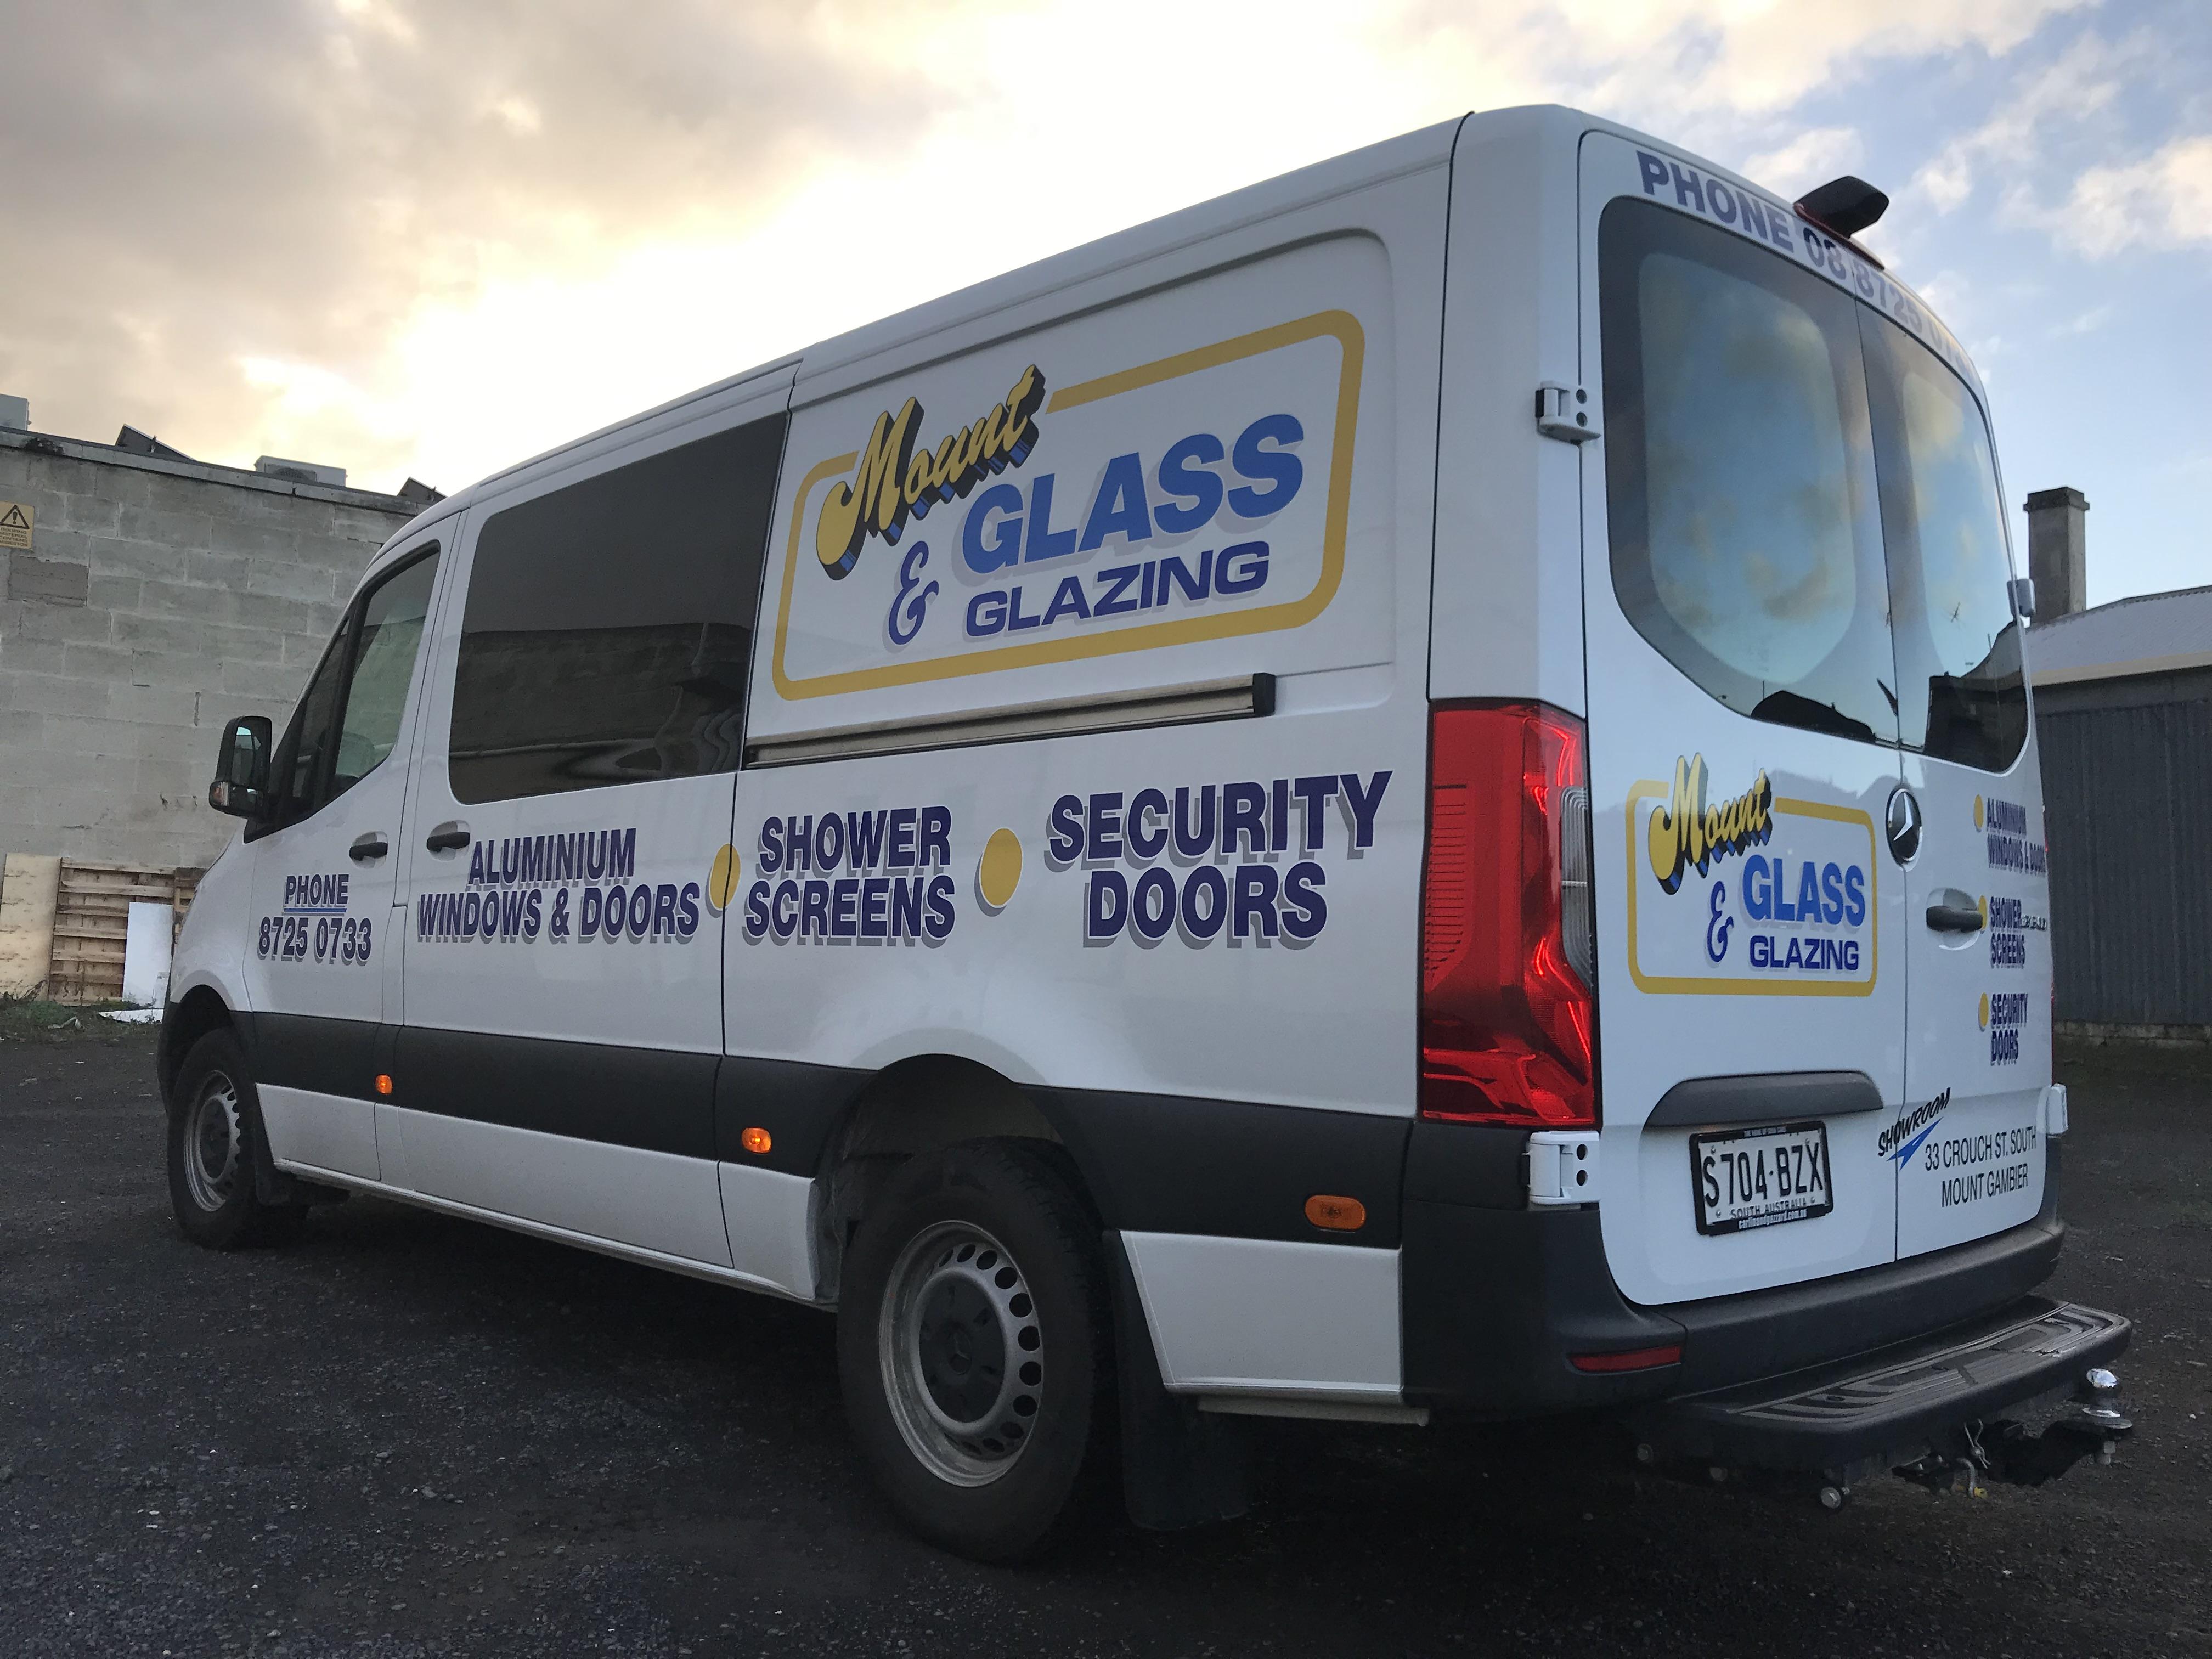 Mount Glass & Glazing Van Signage